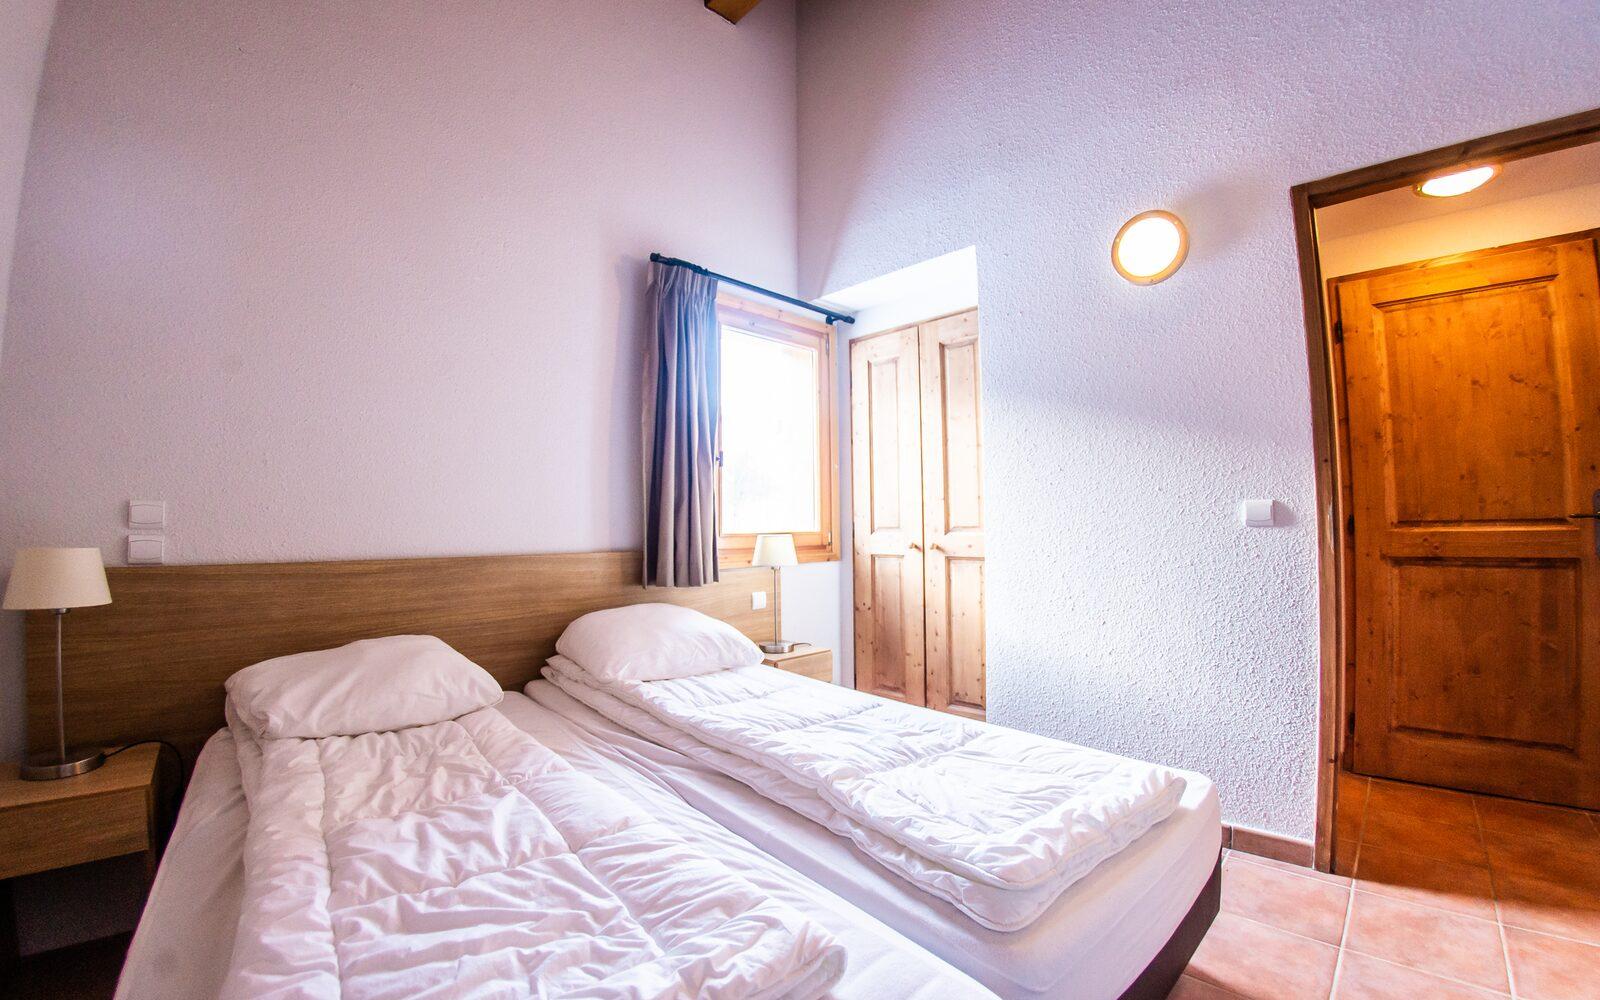 2-kamer appartement + vide | 6 personen